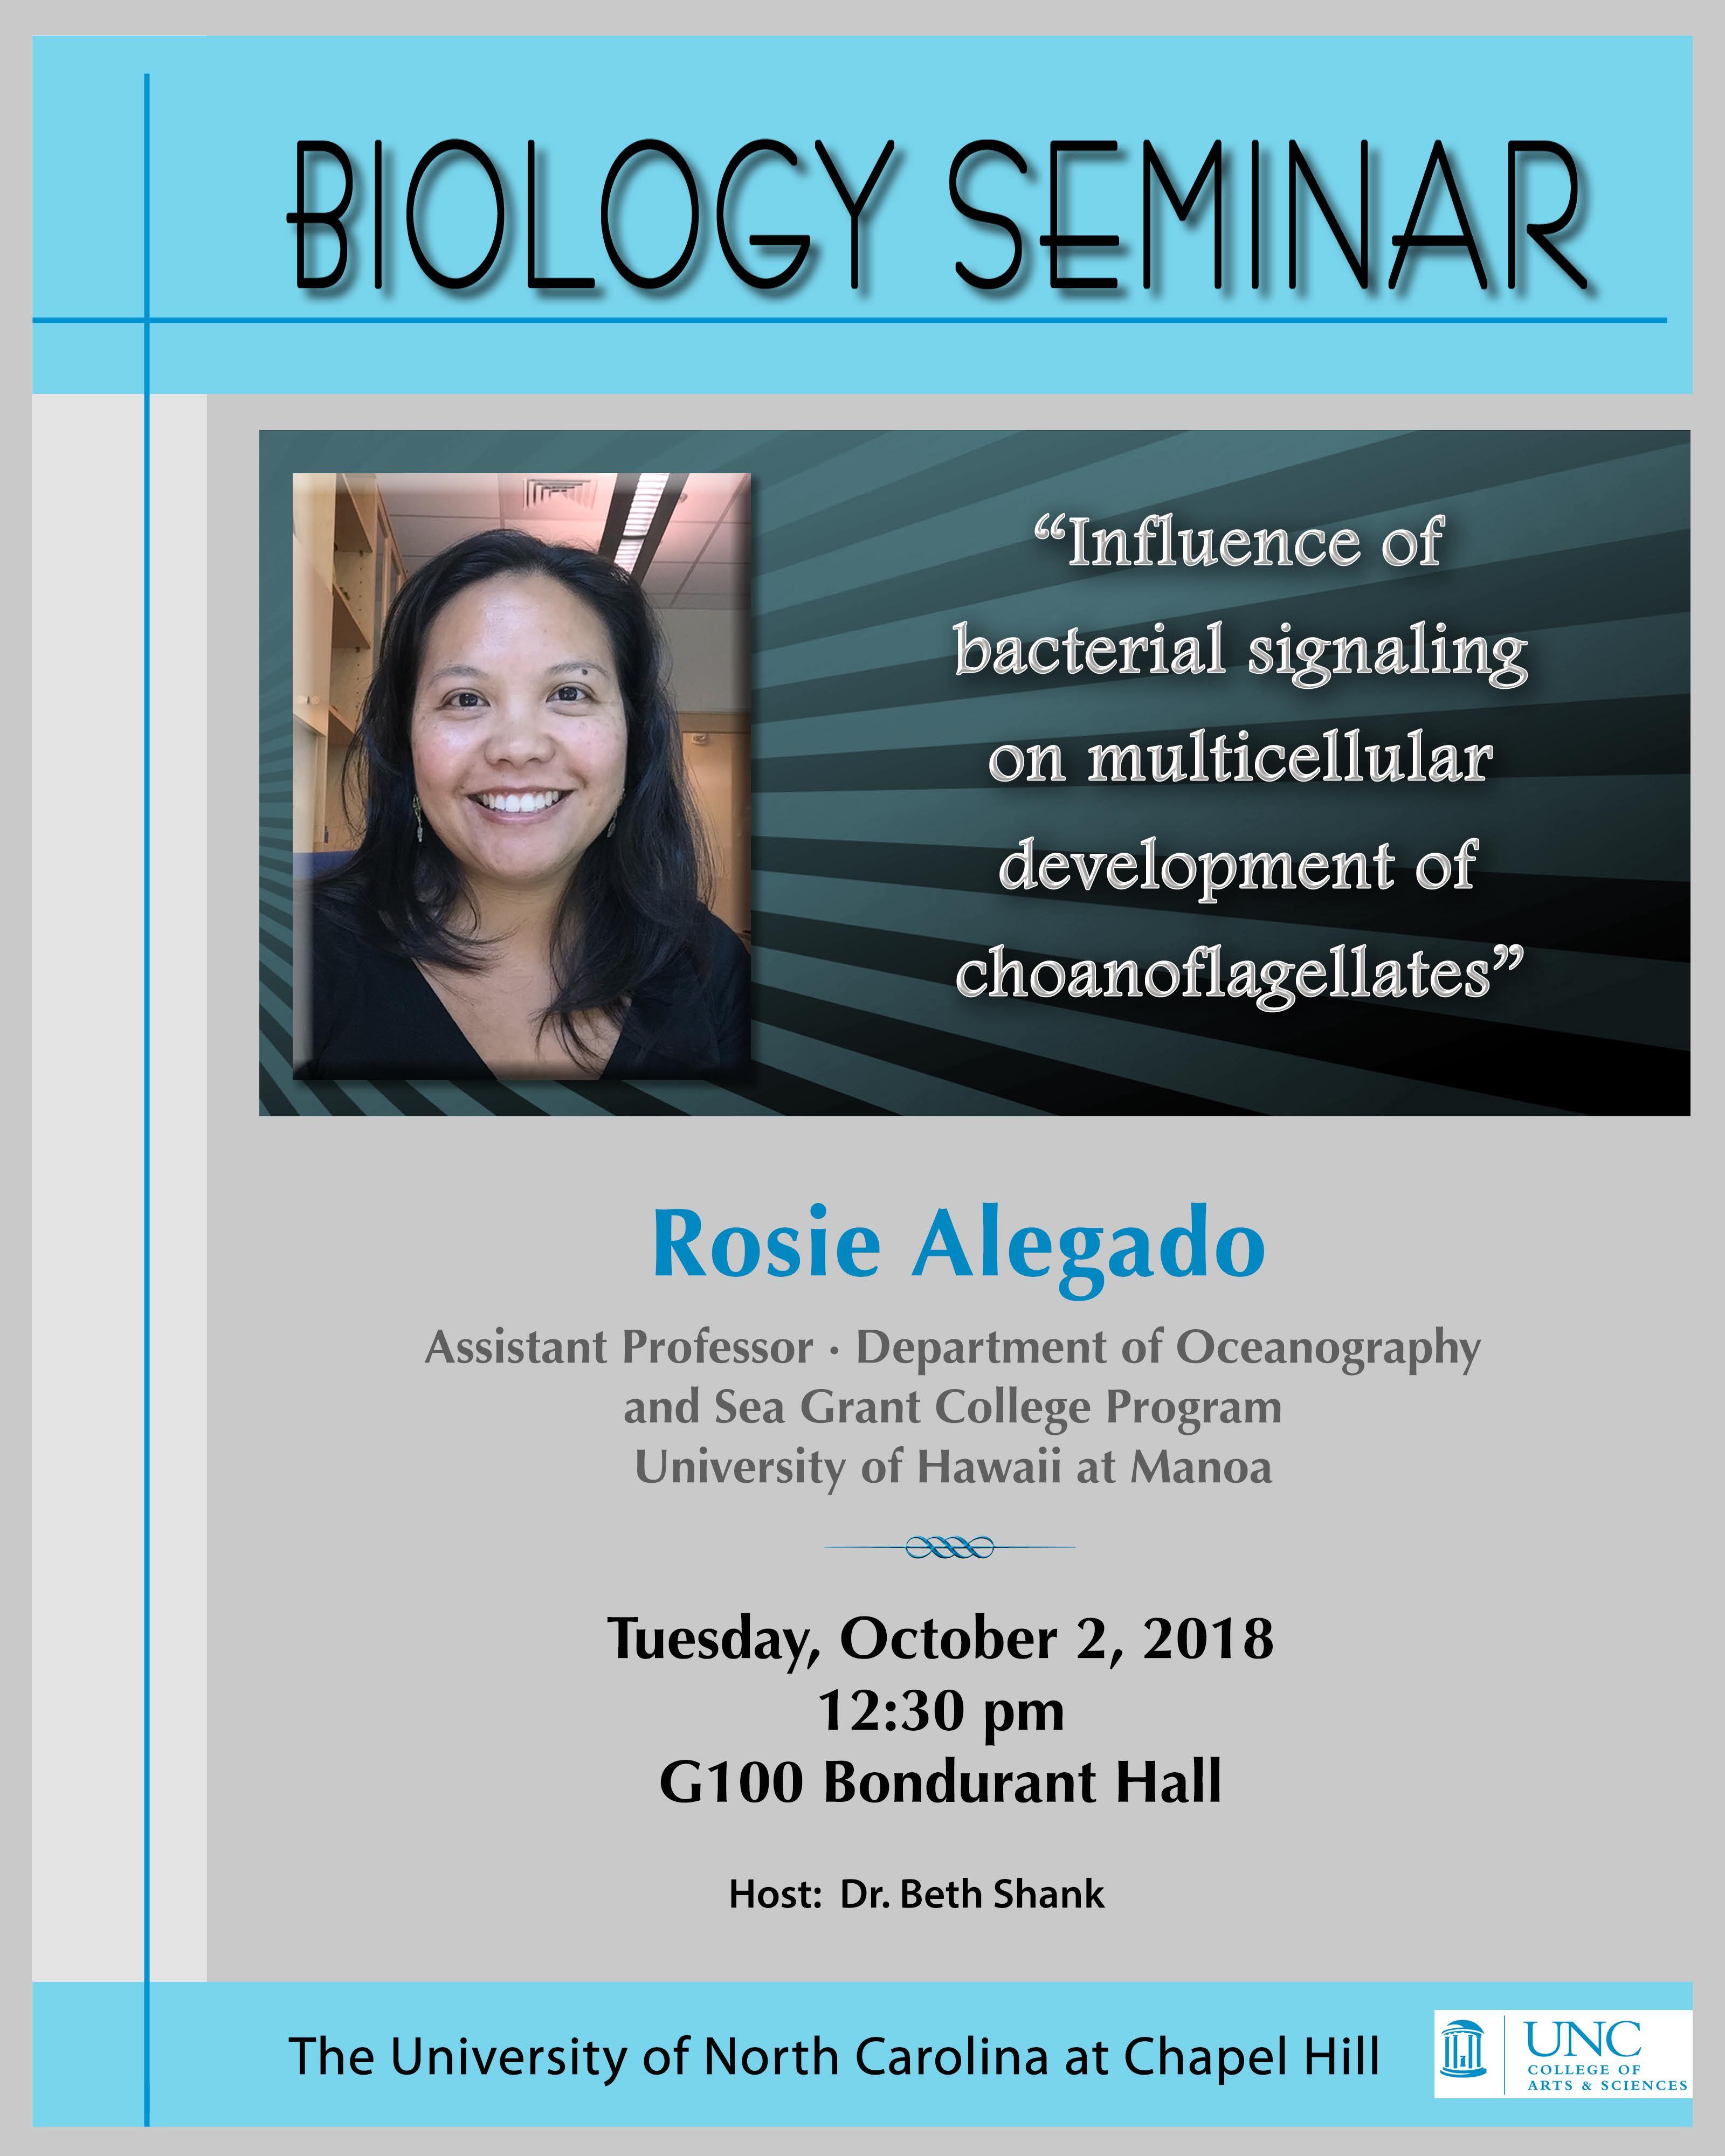 10-02-18_Rosie Alegado seminar - UNC DEPARTMENT OF BIOLOGY